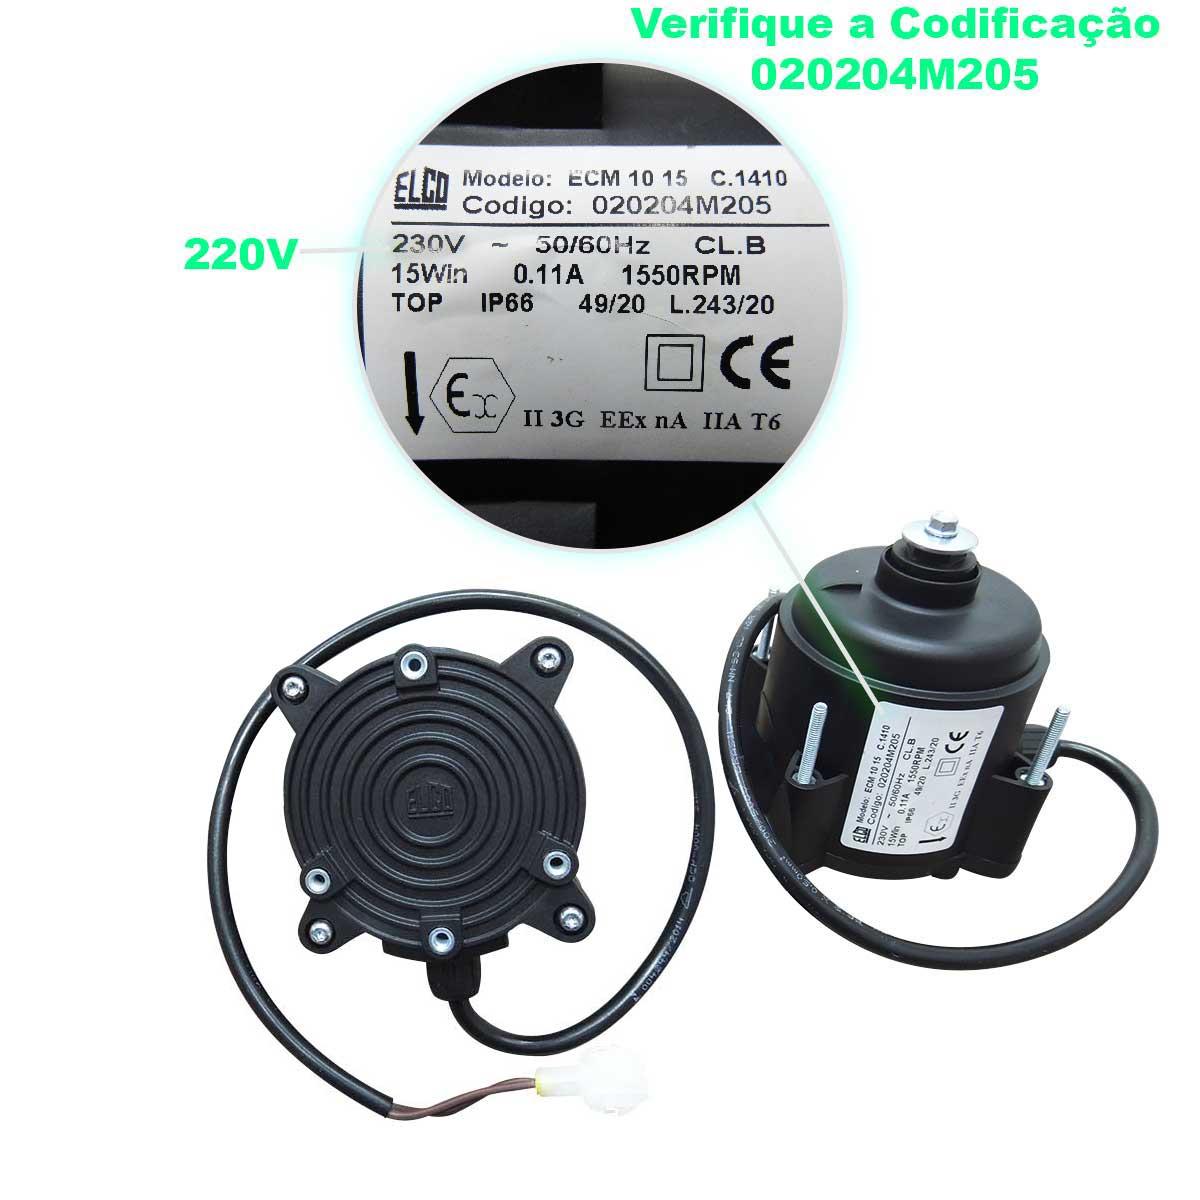 Micro Motor Elco  ECM 10-15 220V para equipamentos Metalfrio VN 25 50 VB 18 28 55 60 com conector selado